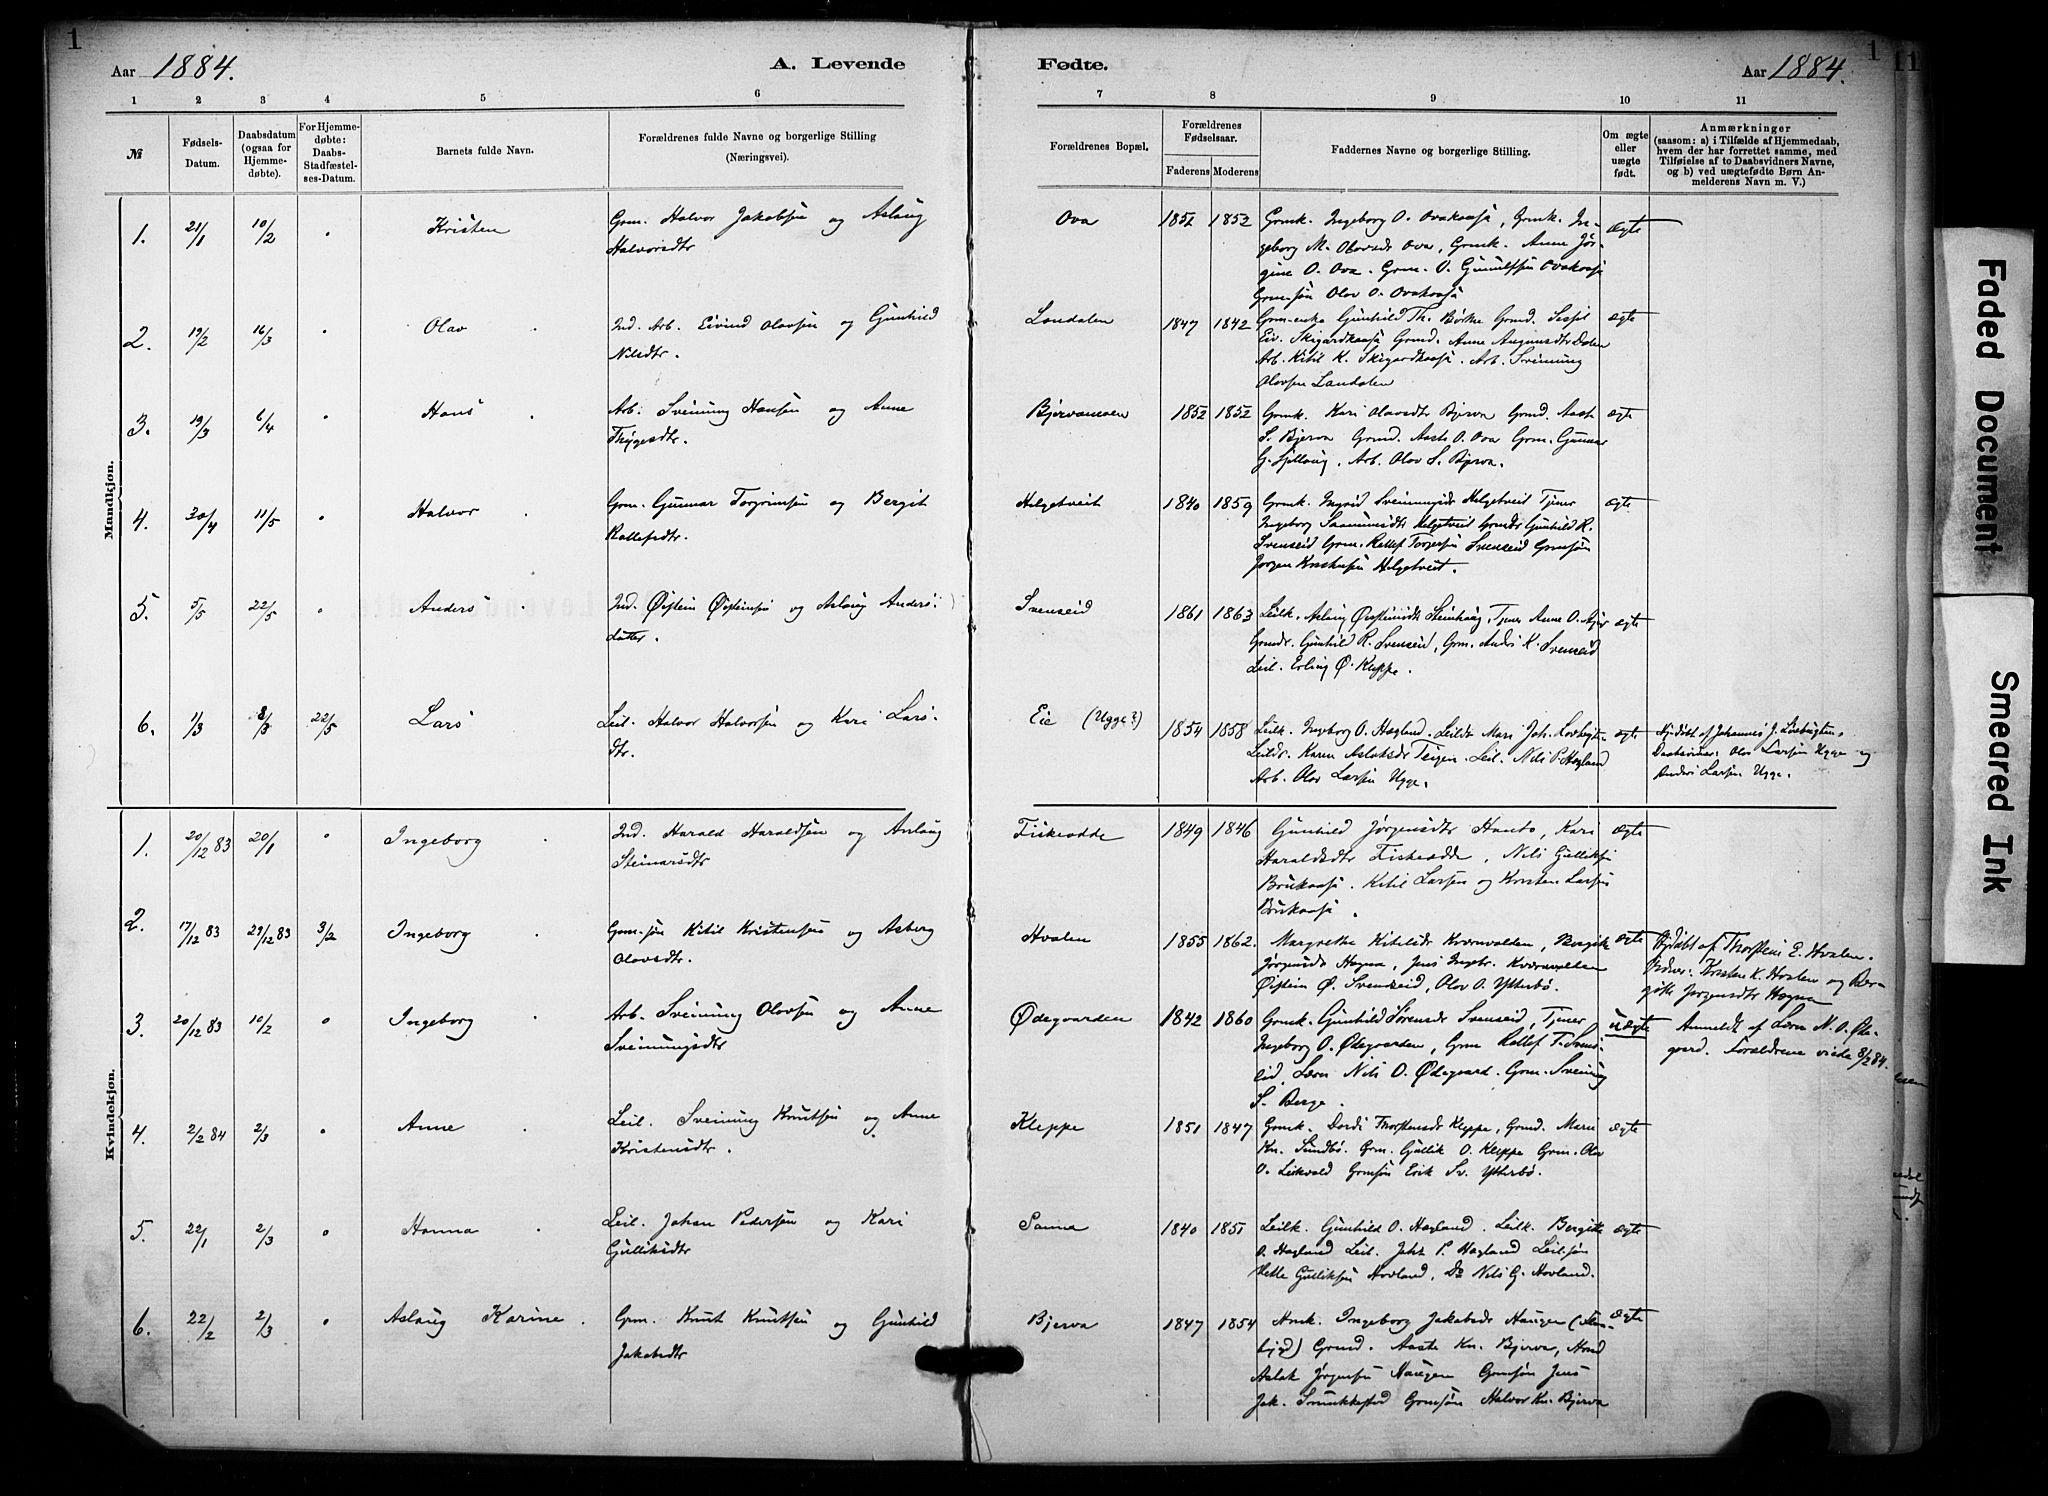 SAKO, Lunde kirkebøker, F/Fa/L0002: Ministerialbok nr. I 2, 1884-1892, s. 1